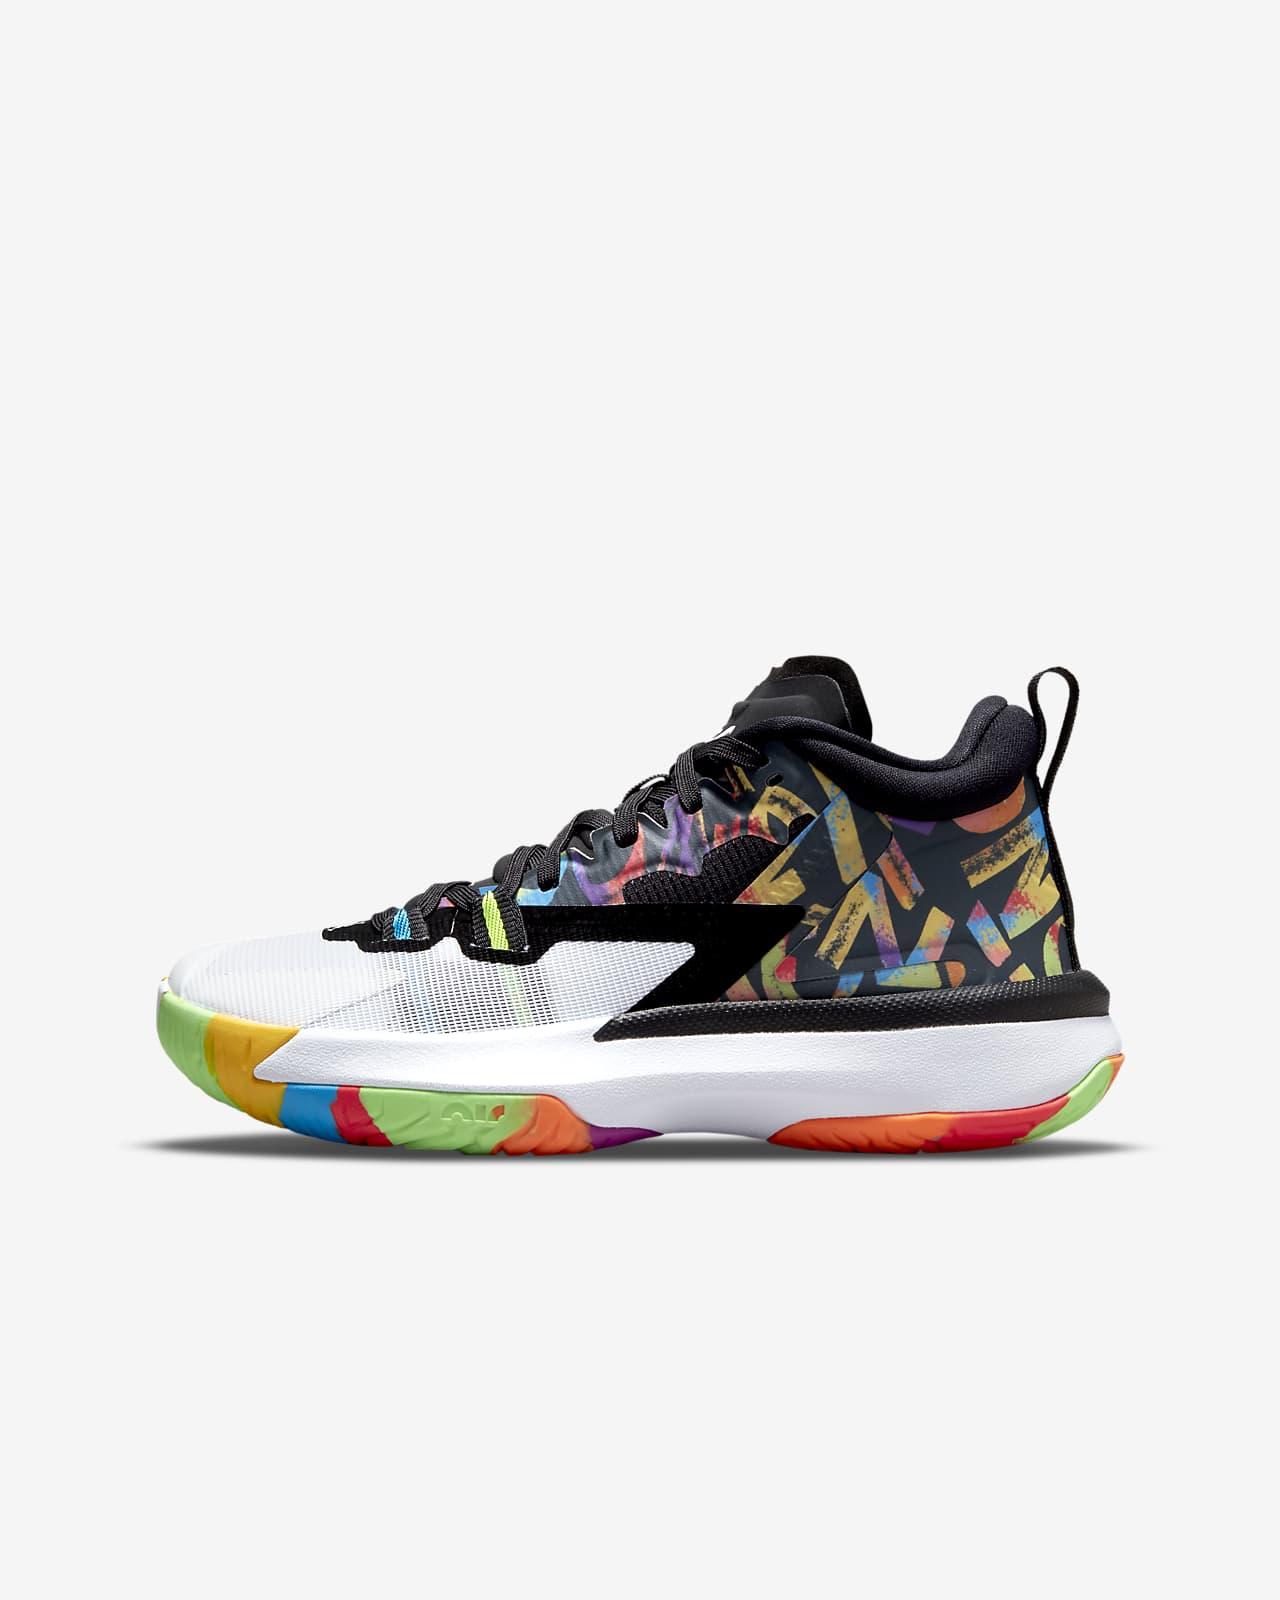 Zion 1 Older Kids' Shoes